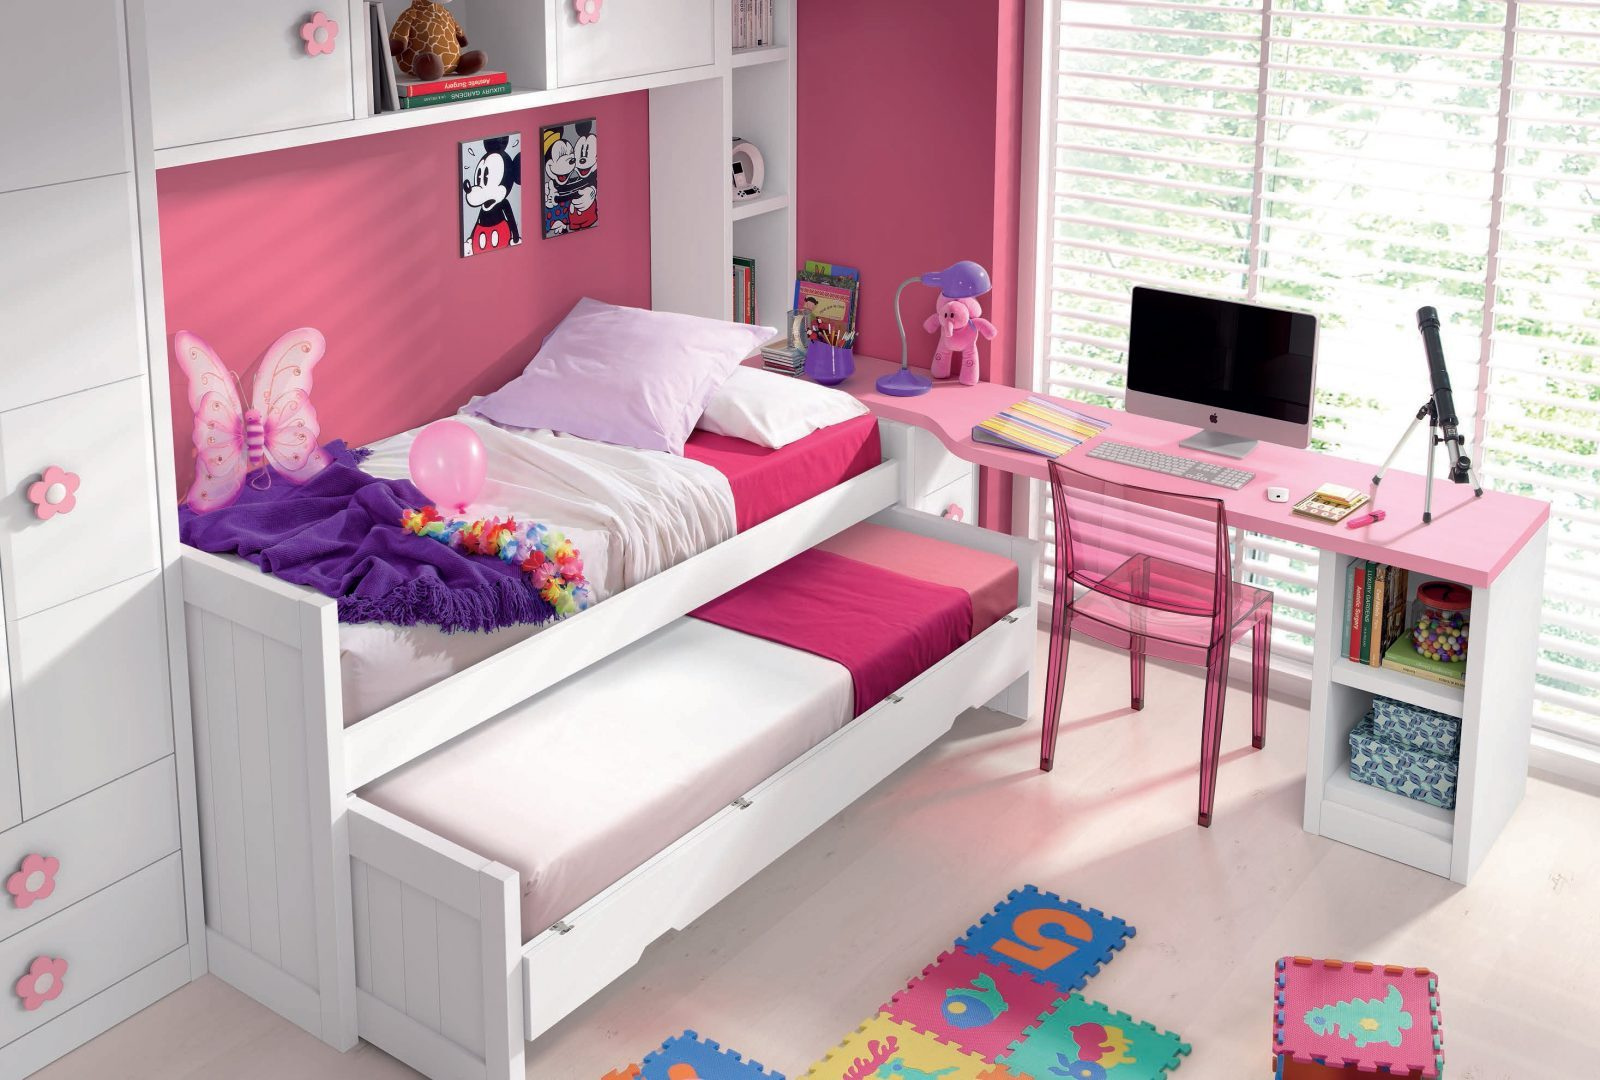 Mueble juvenil 989 161 mueble juvenil guarpi tienda de muebles muebles al - Mobiliario juvenil barcelona ...